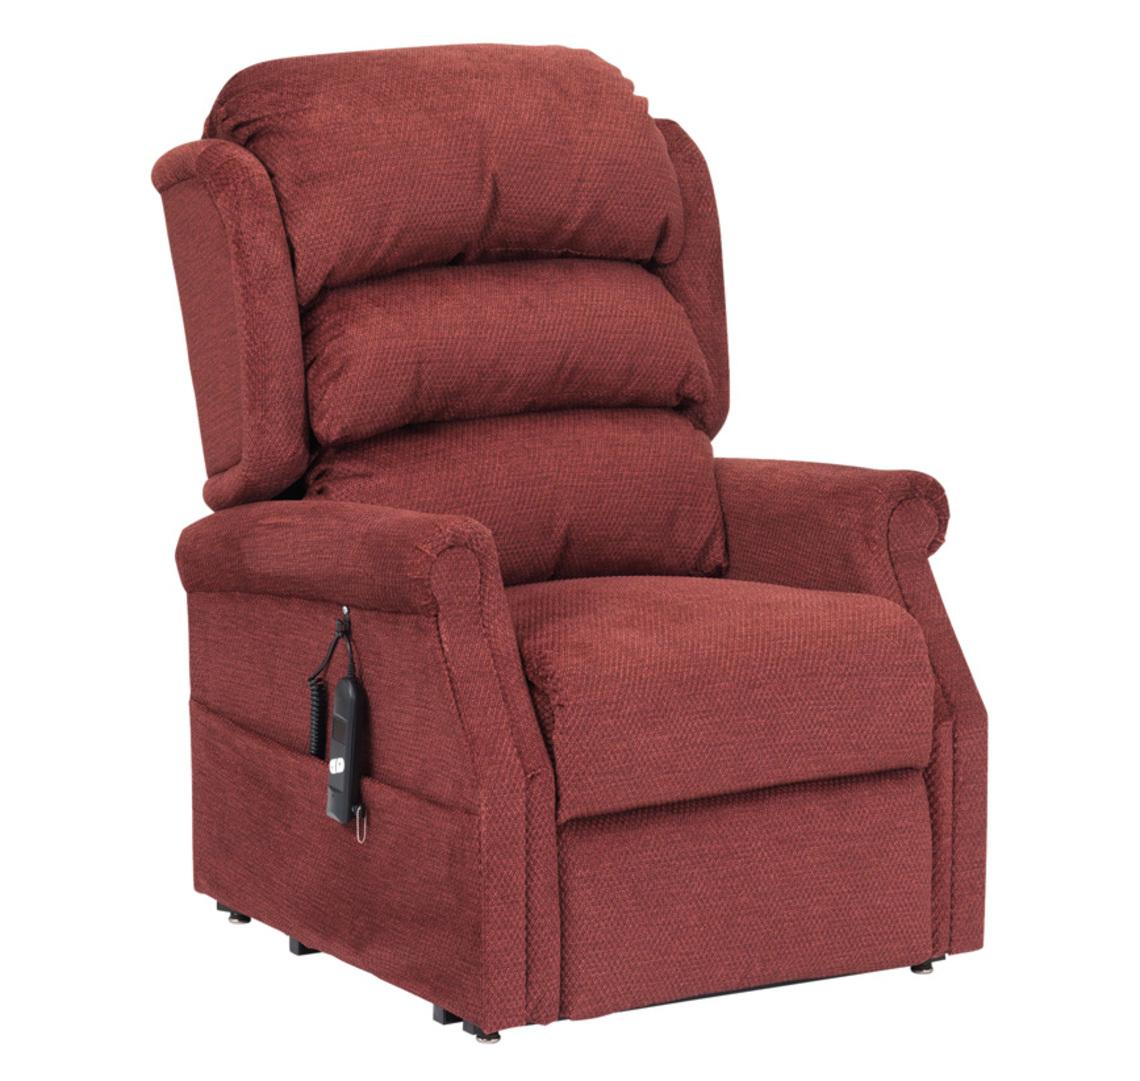 swivel chair risers ballard designs dining chairs washington riser recliner world of scooters manchester